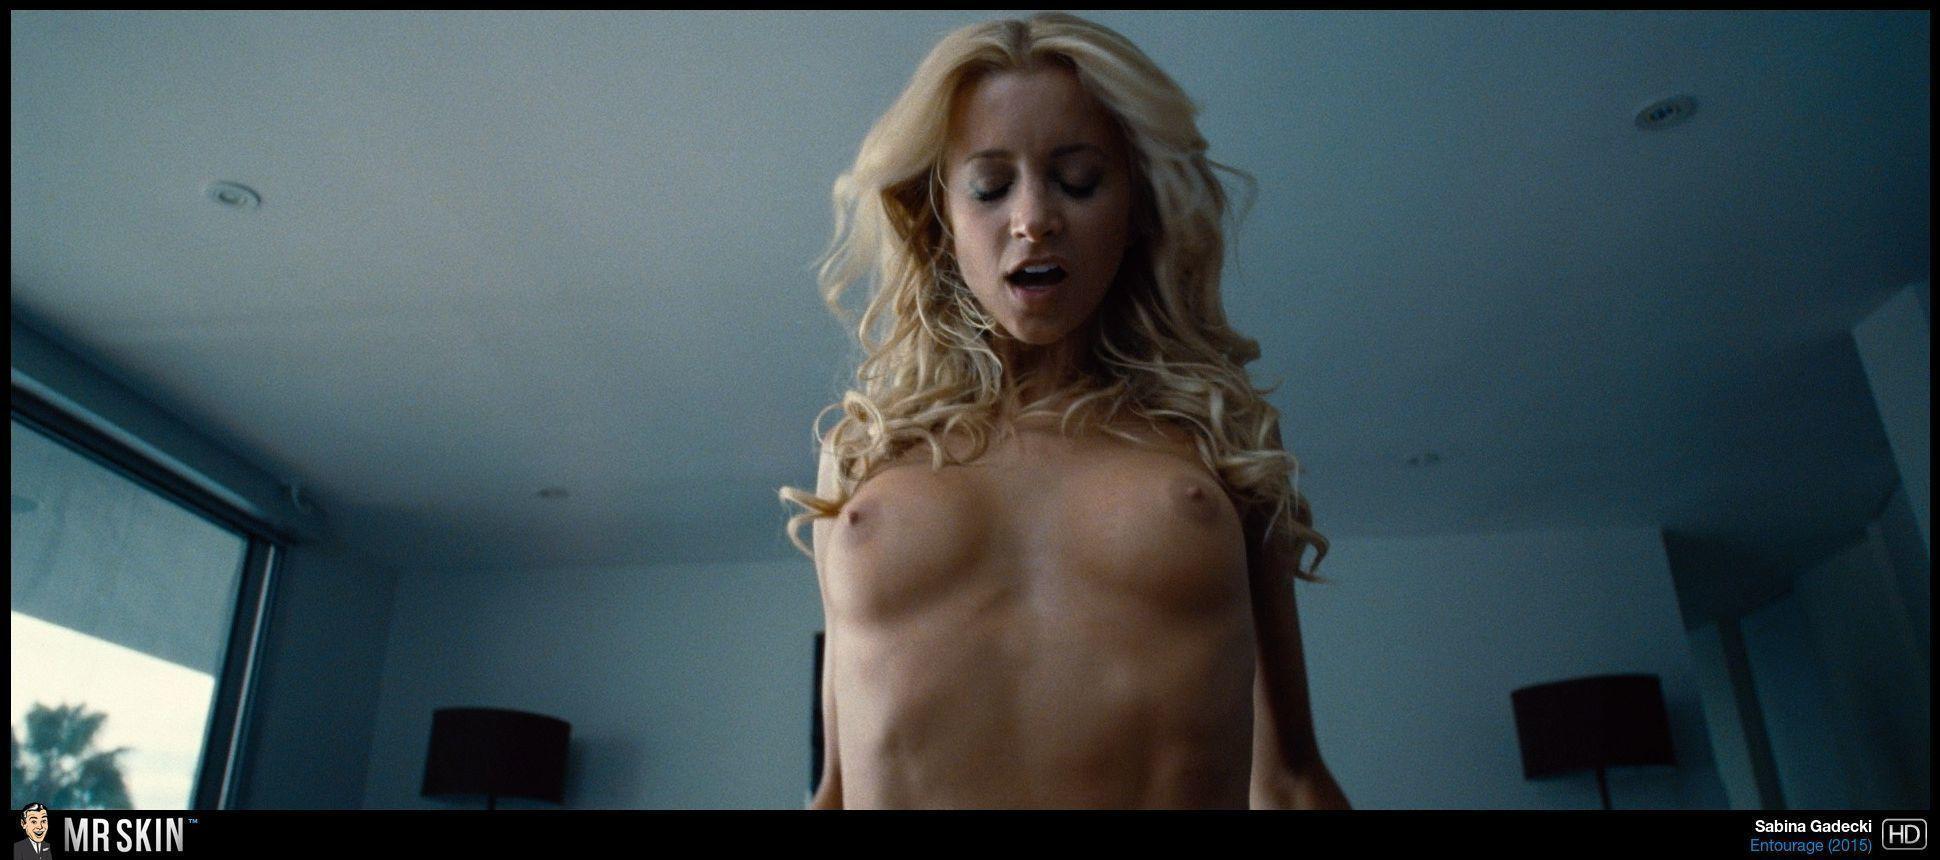 Sabina Gadecki Nude 17